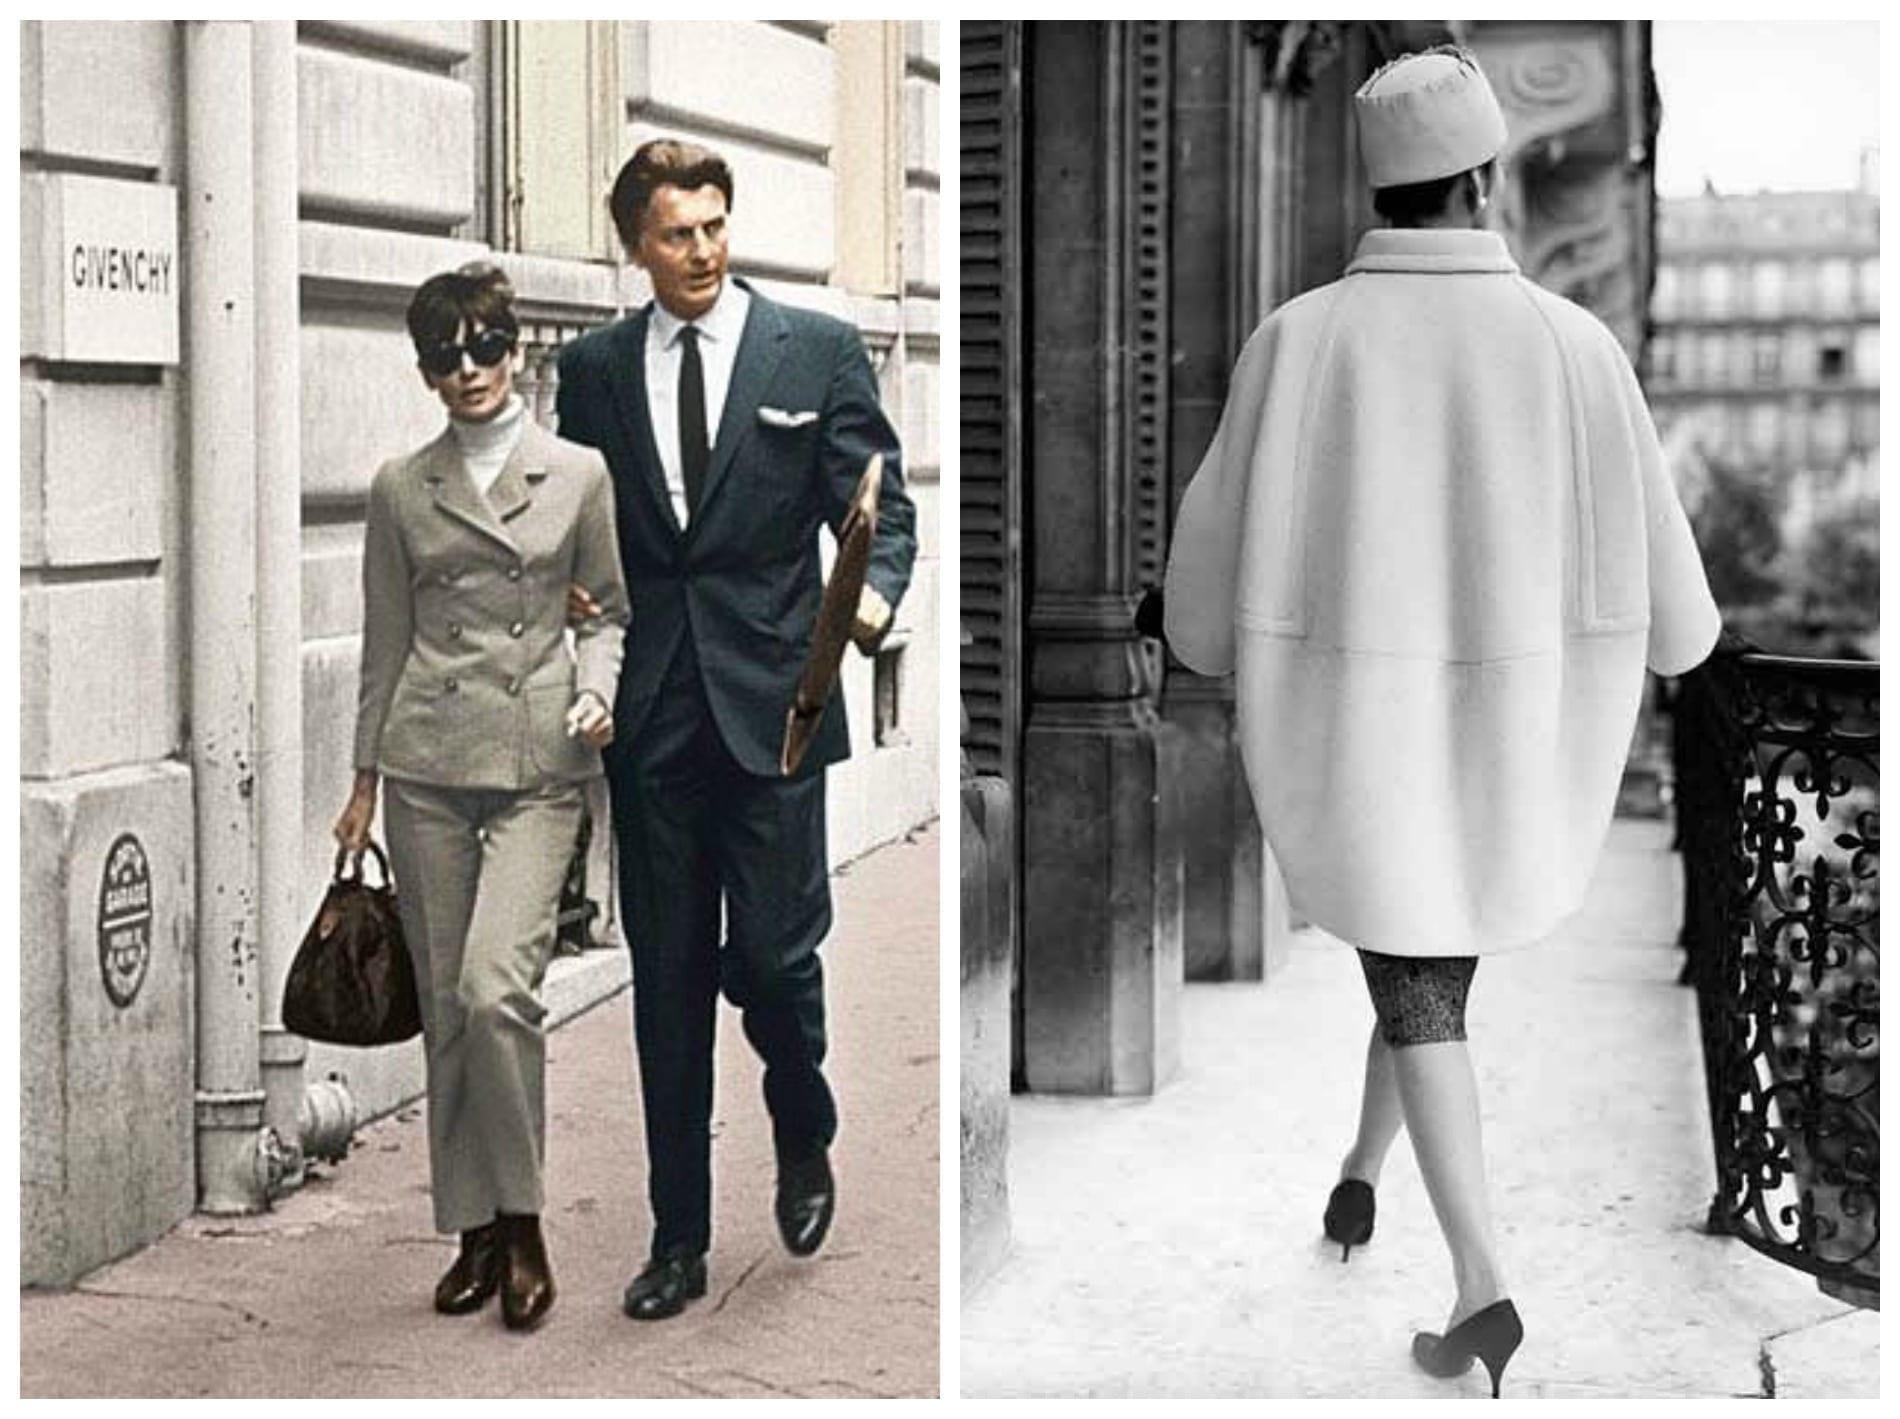 Hubert de Givenchy morte, Hubert de Givenchy audrey hepburn, theladycracy.it, elisa bellino, blogger moda italiane famose 2018, hubert de ginvenchy storia, hubert de ginvenchy frasi